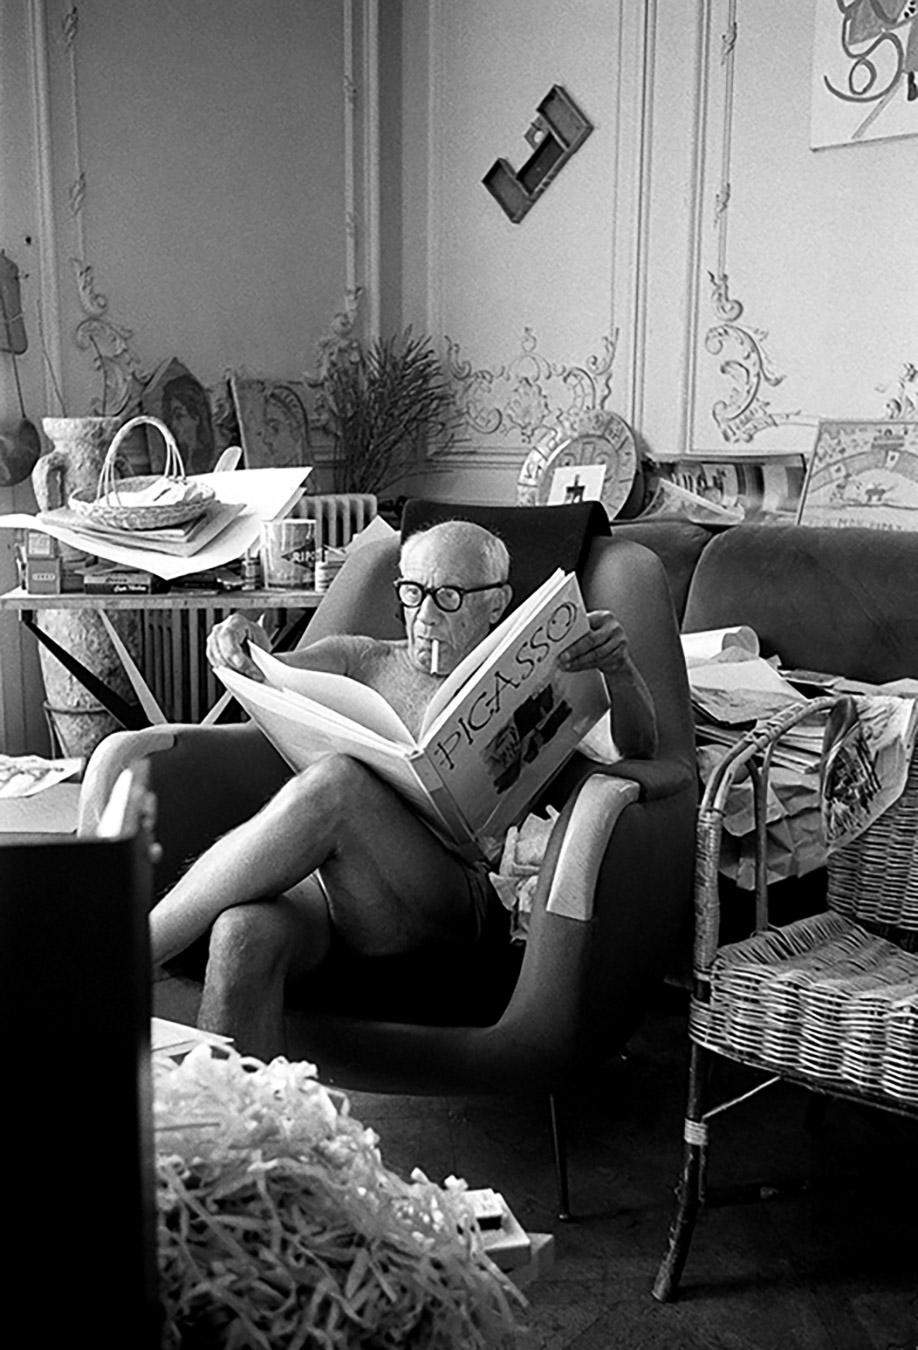 Picasso reading book on himself, Villa La Californie, Cannes 1961 Silver gelatin print 94x66cm